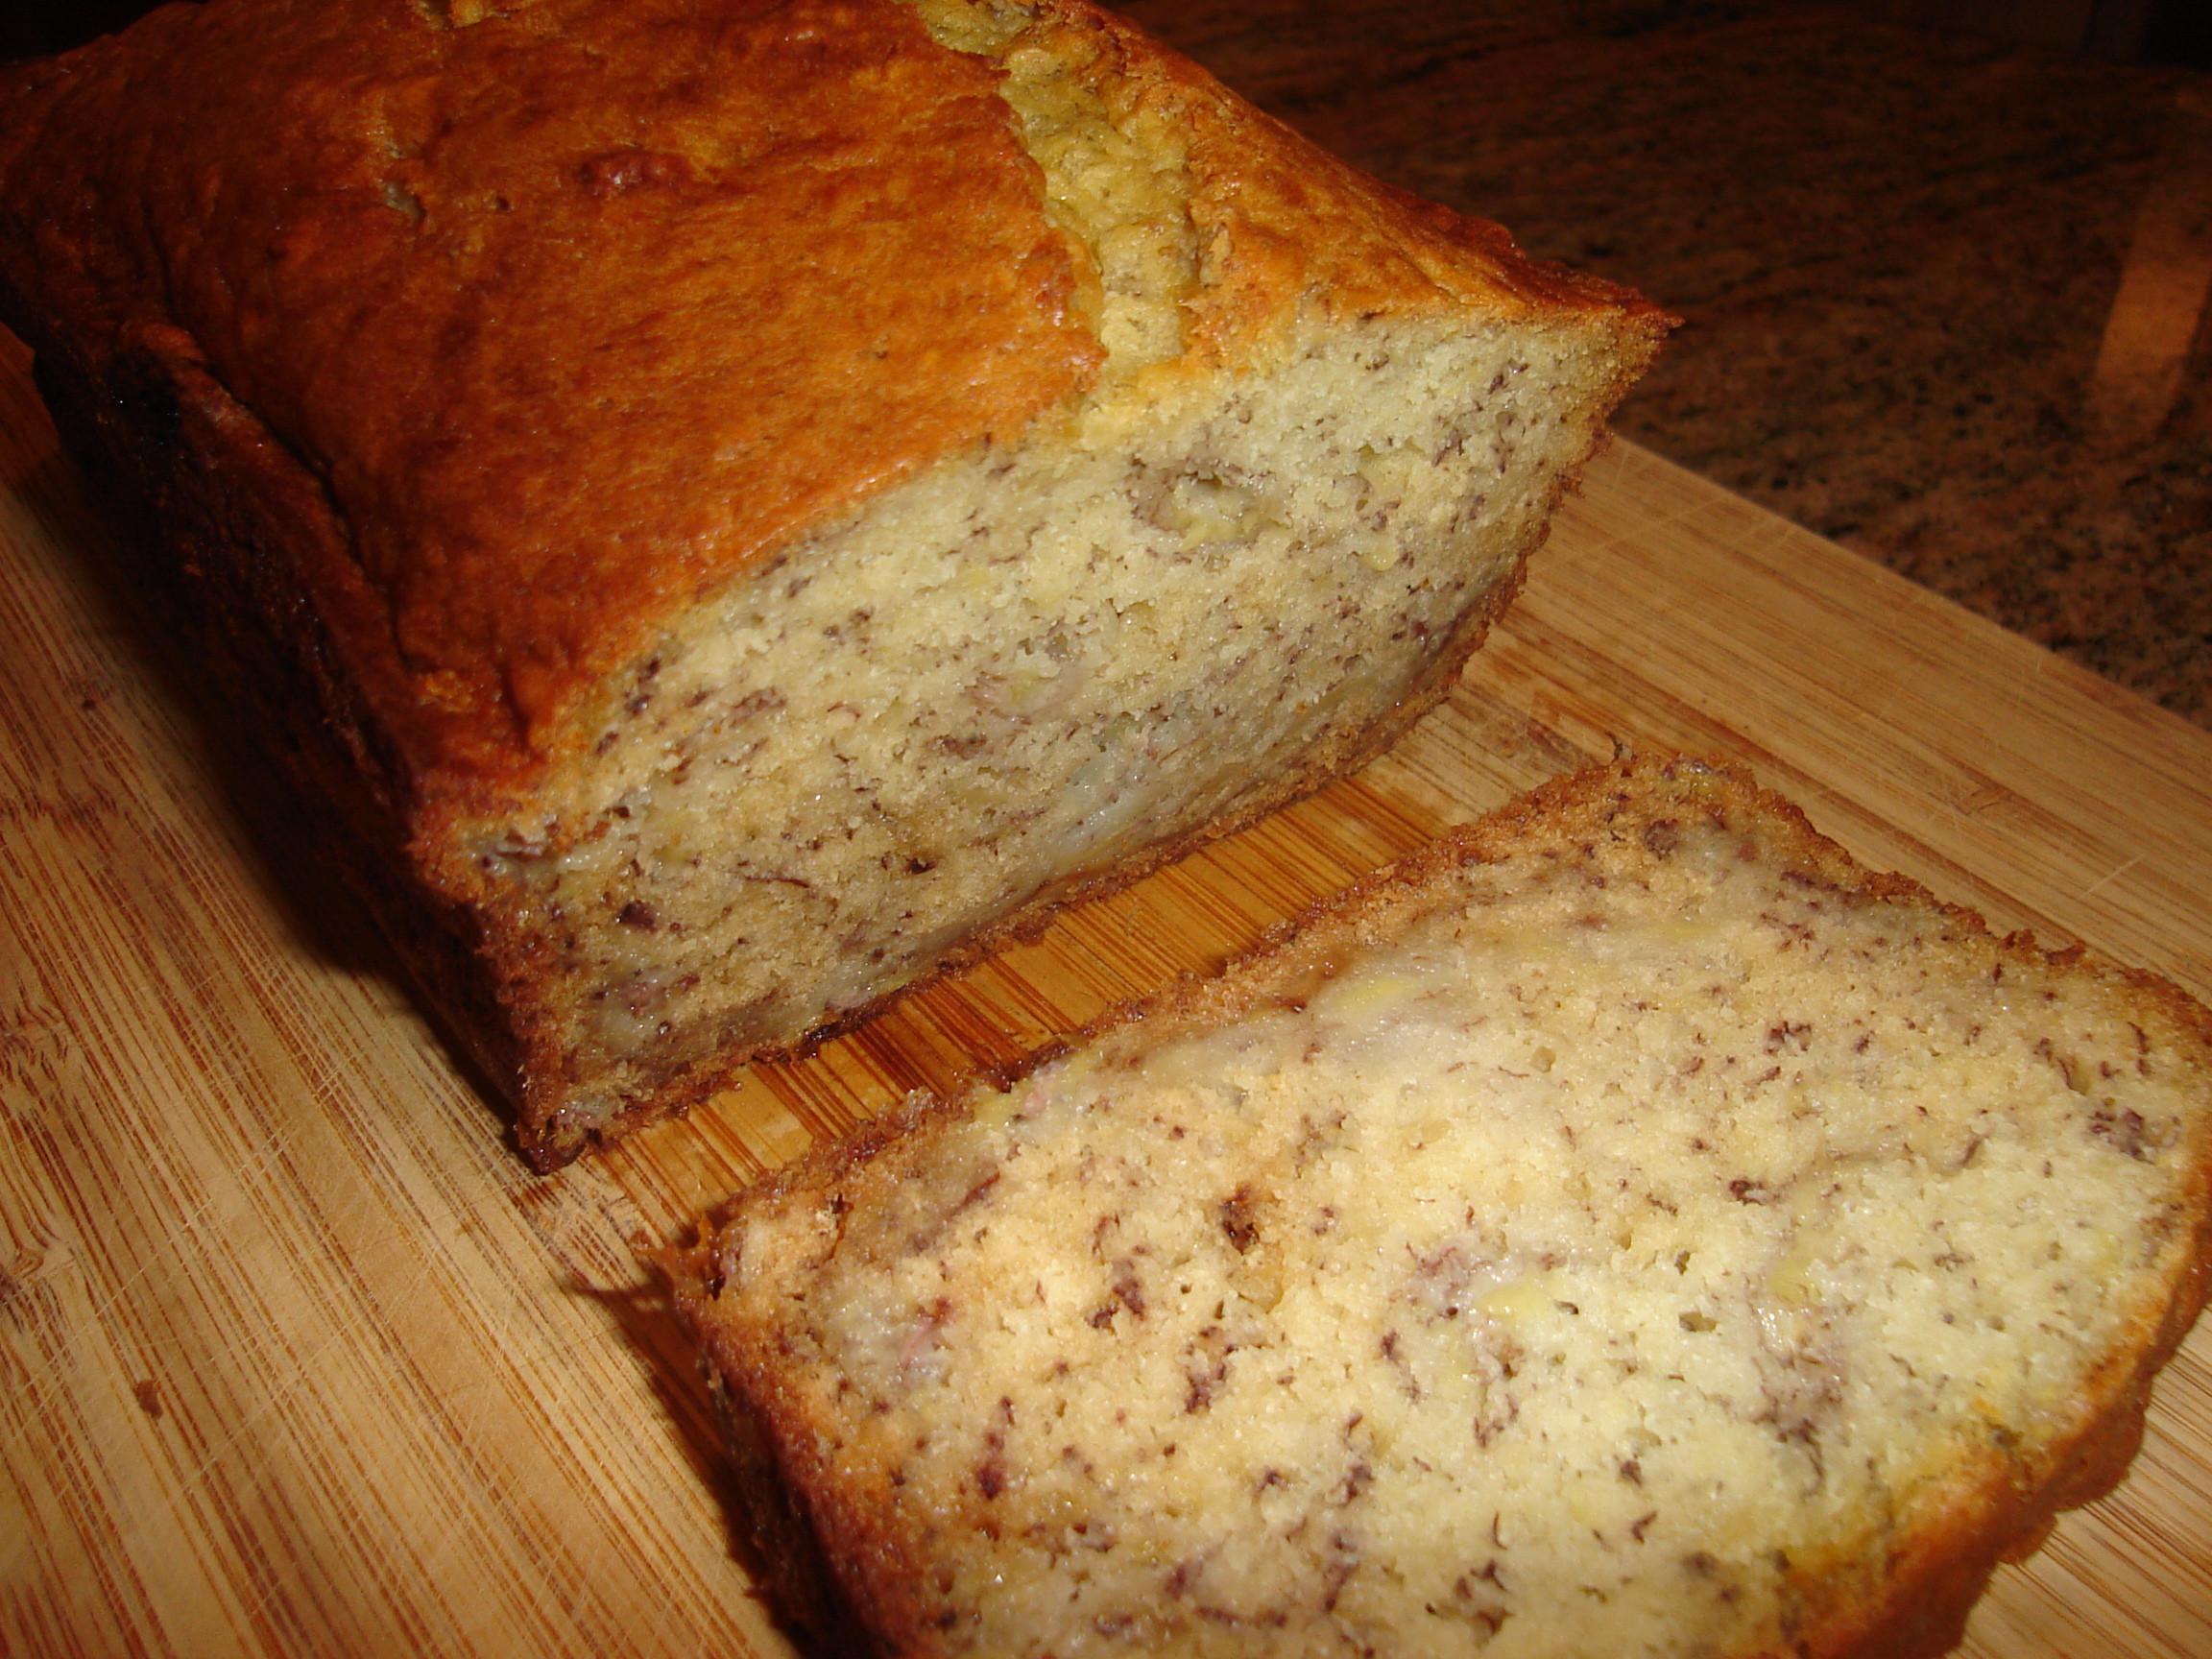 Sour Cream Banana Bread  Cooking With Elise – Sour Cream Banana Bread